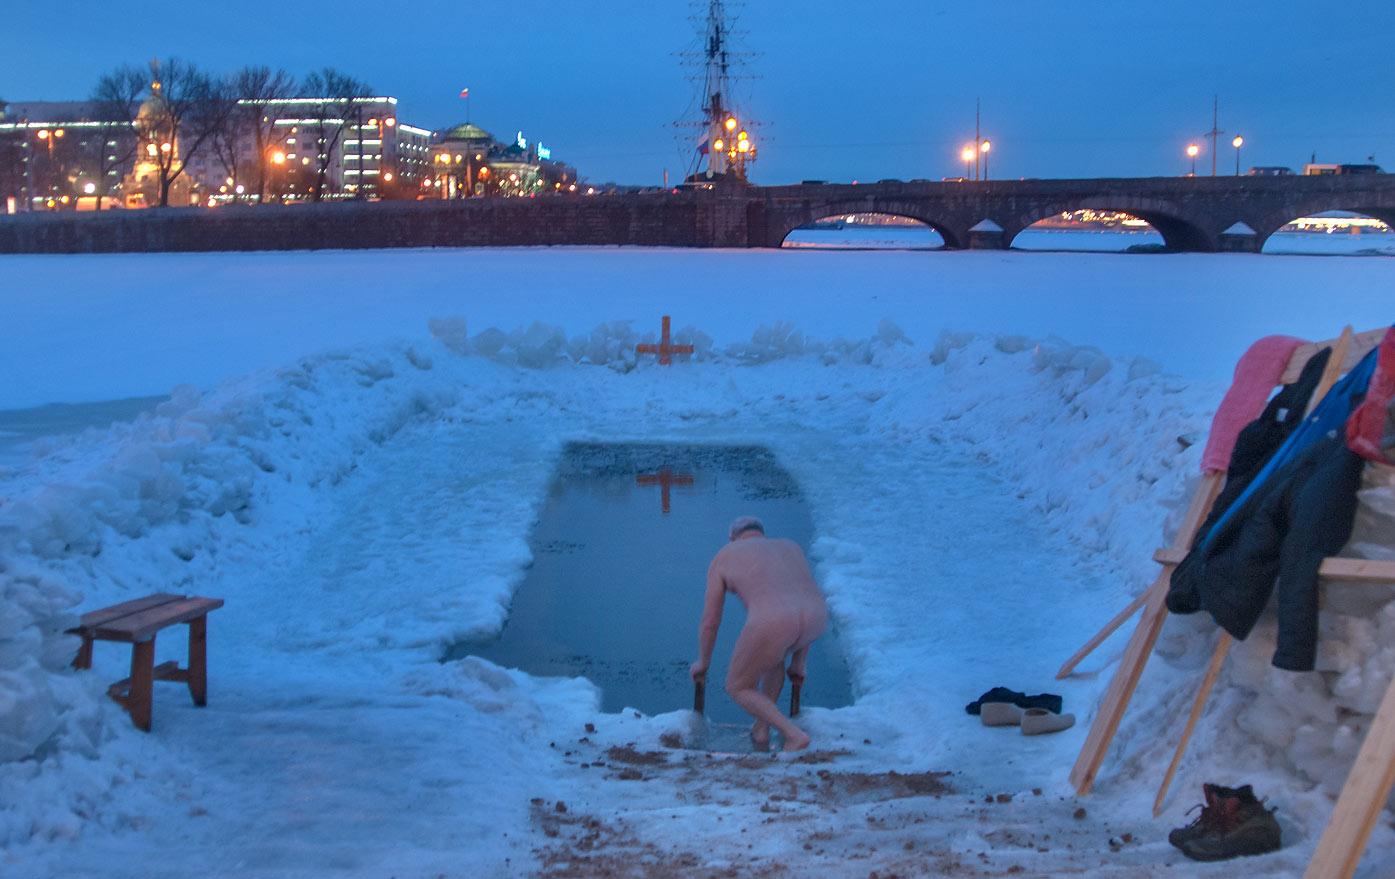 cooling bath, ice bath, cold shower, vladivostok, winter swimming competition, ice swimming, russia, russian, crazy, sports, siberia